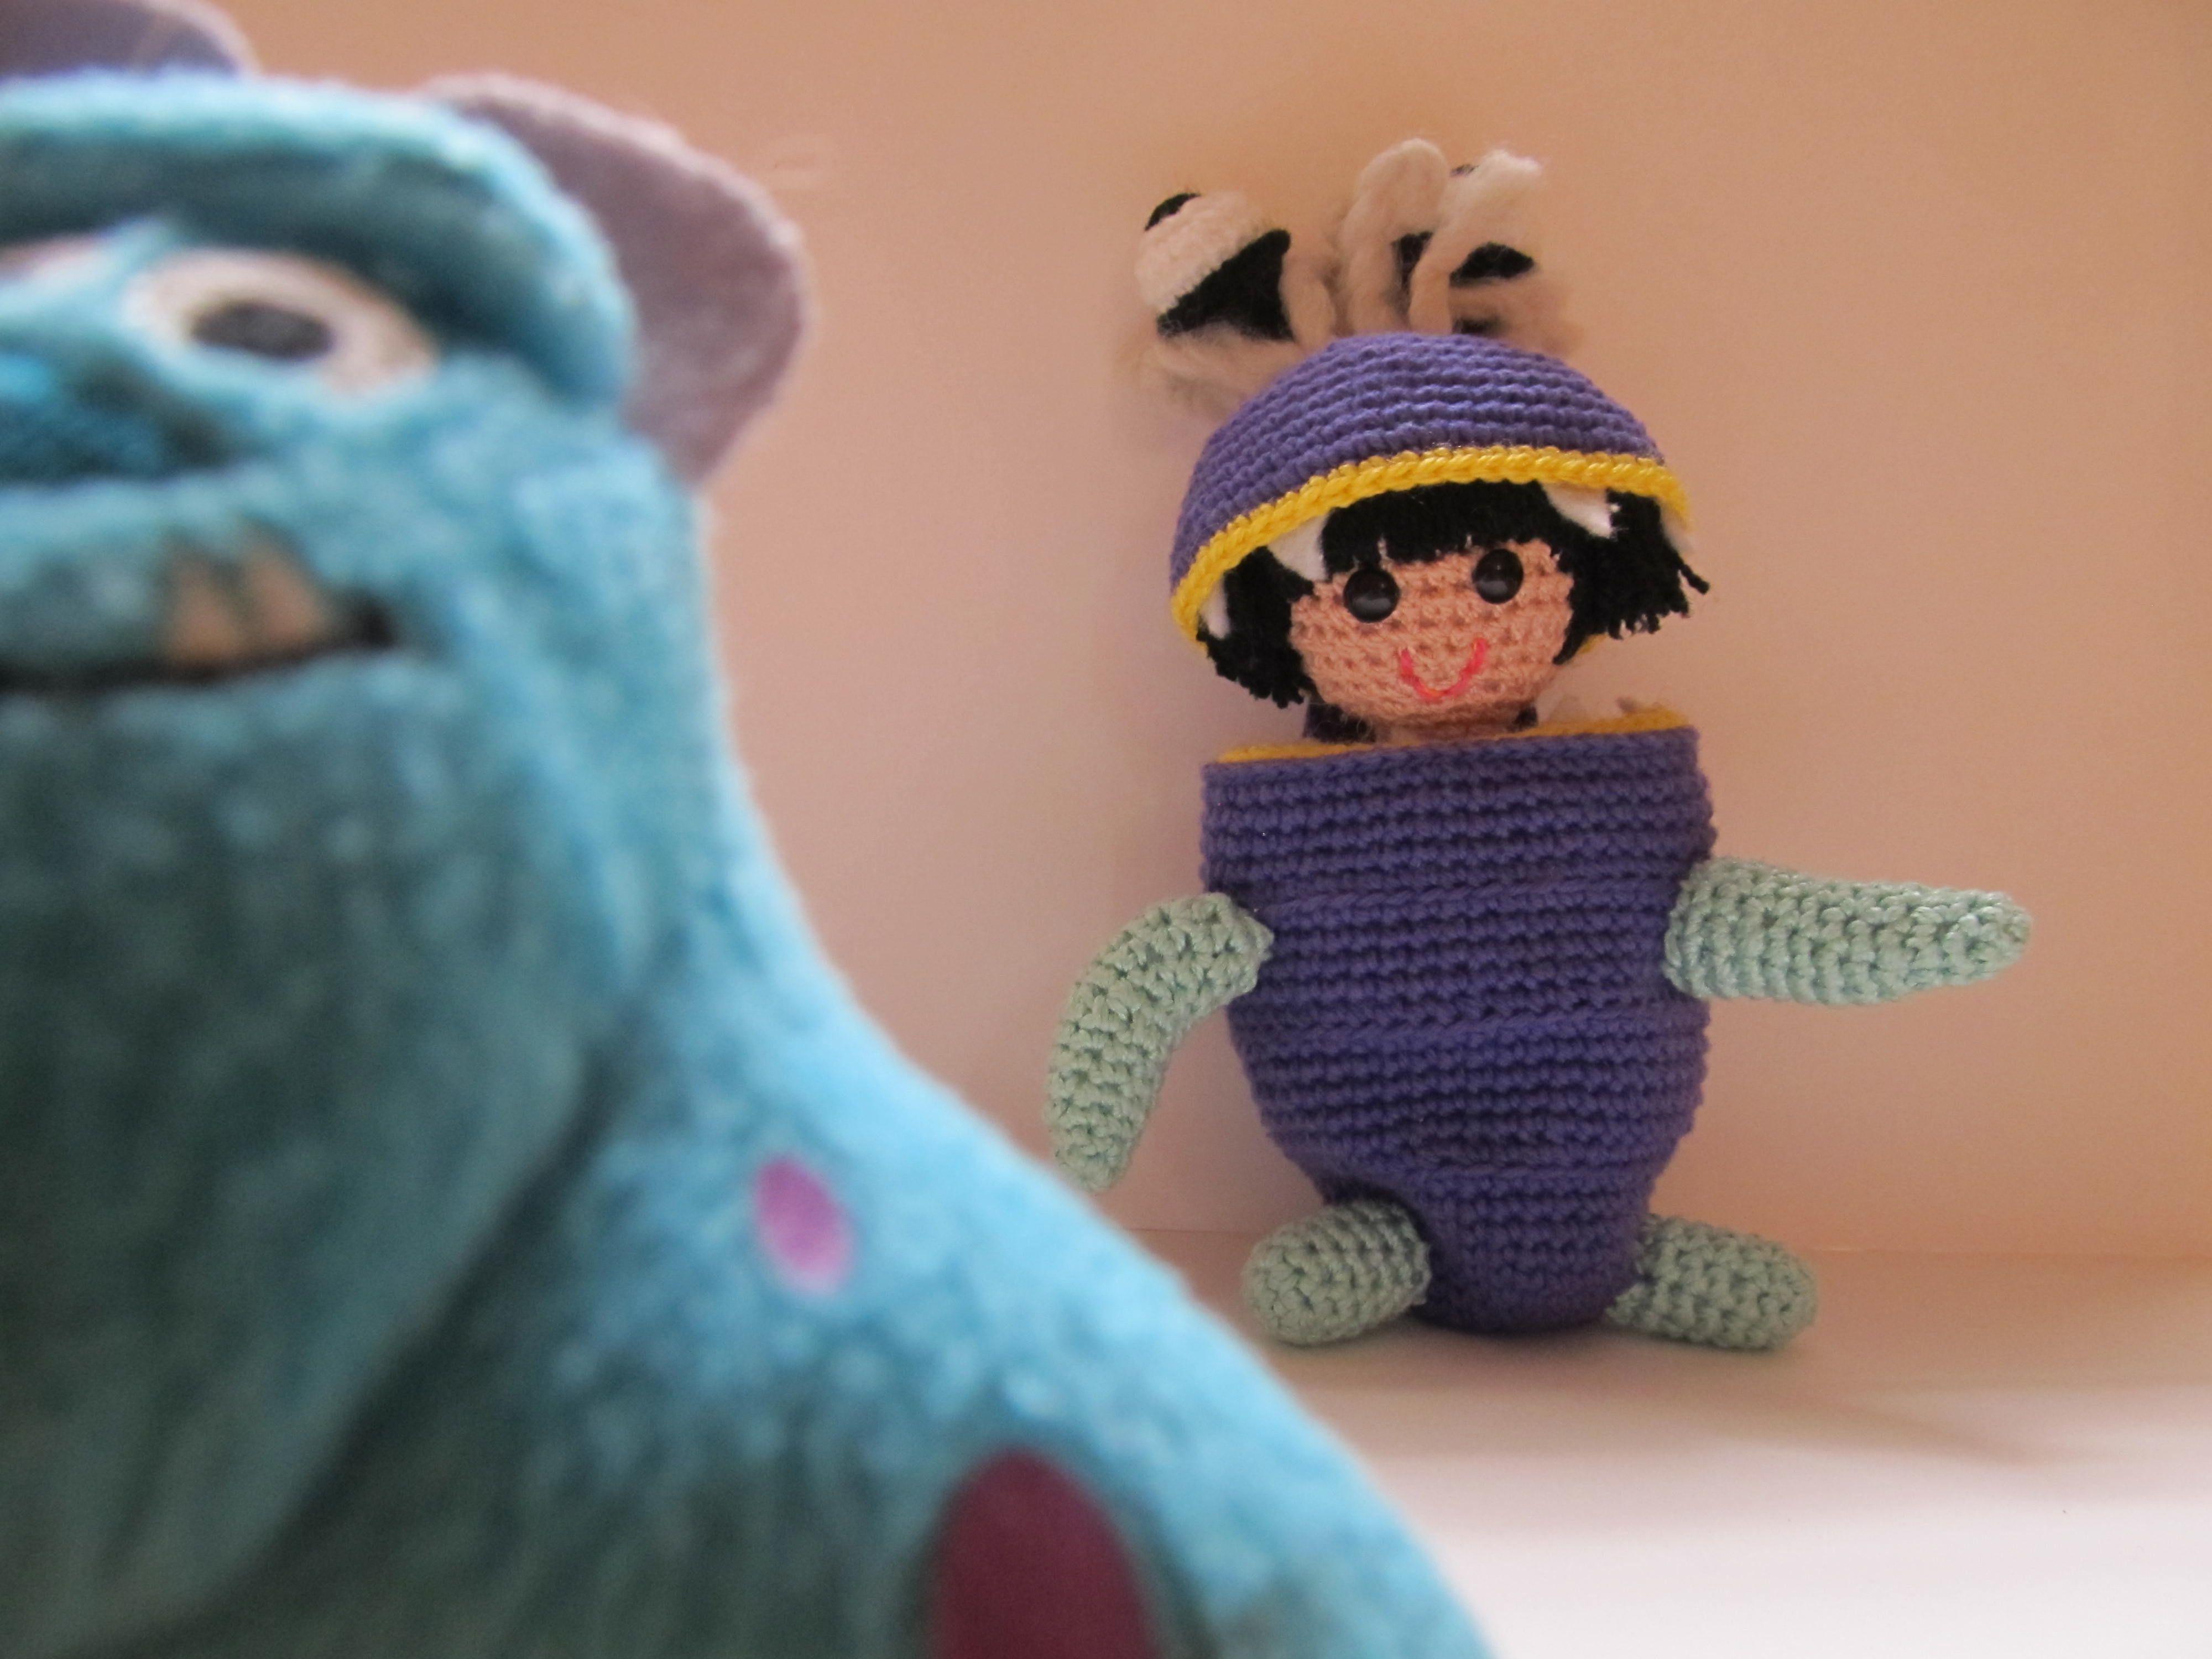 Amigurumis Personajes De Disney : Handmade monsters inc s boo amigurumi original pattern from